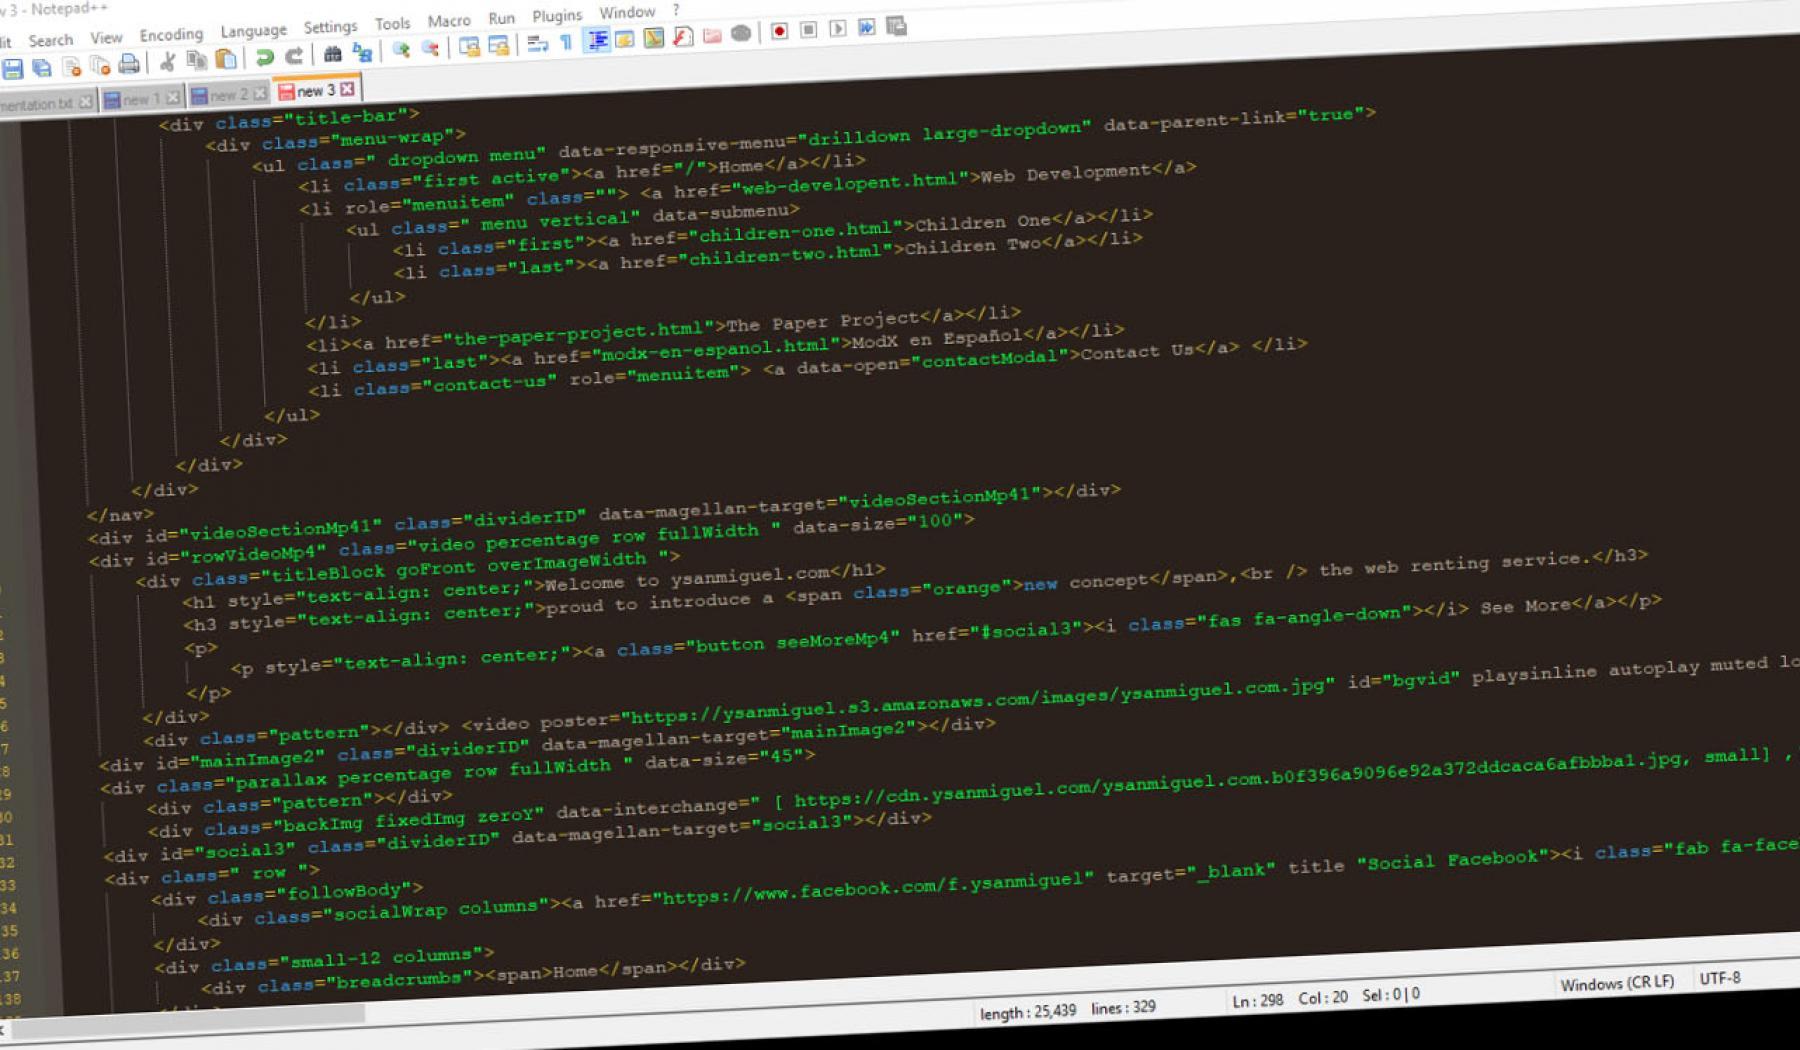 ysanmiguel.com web development